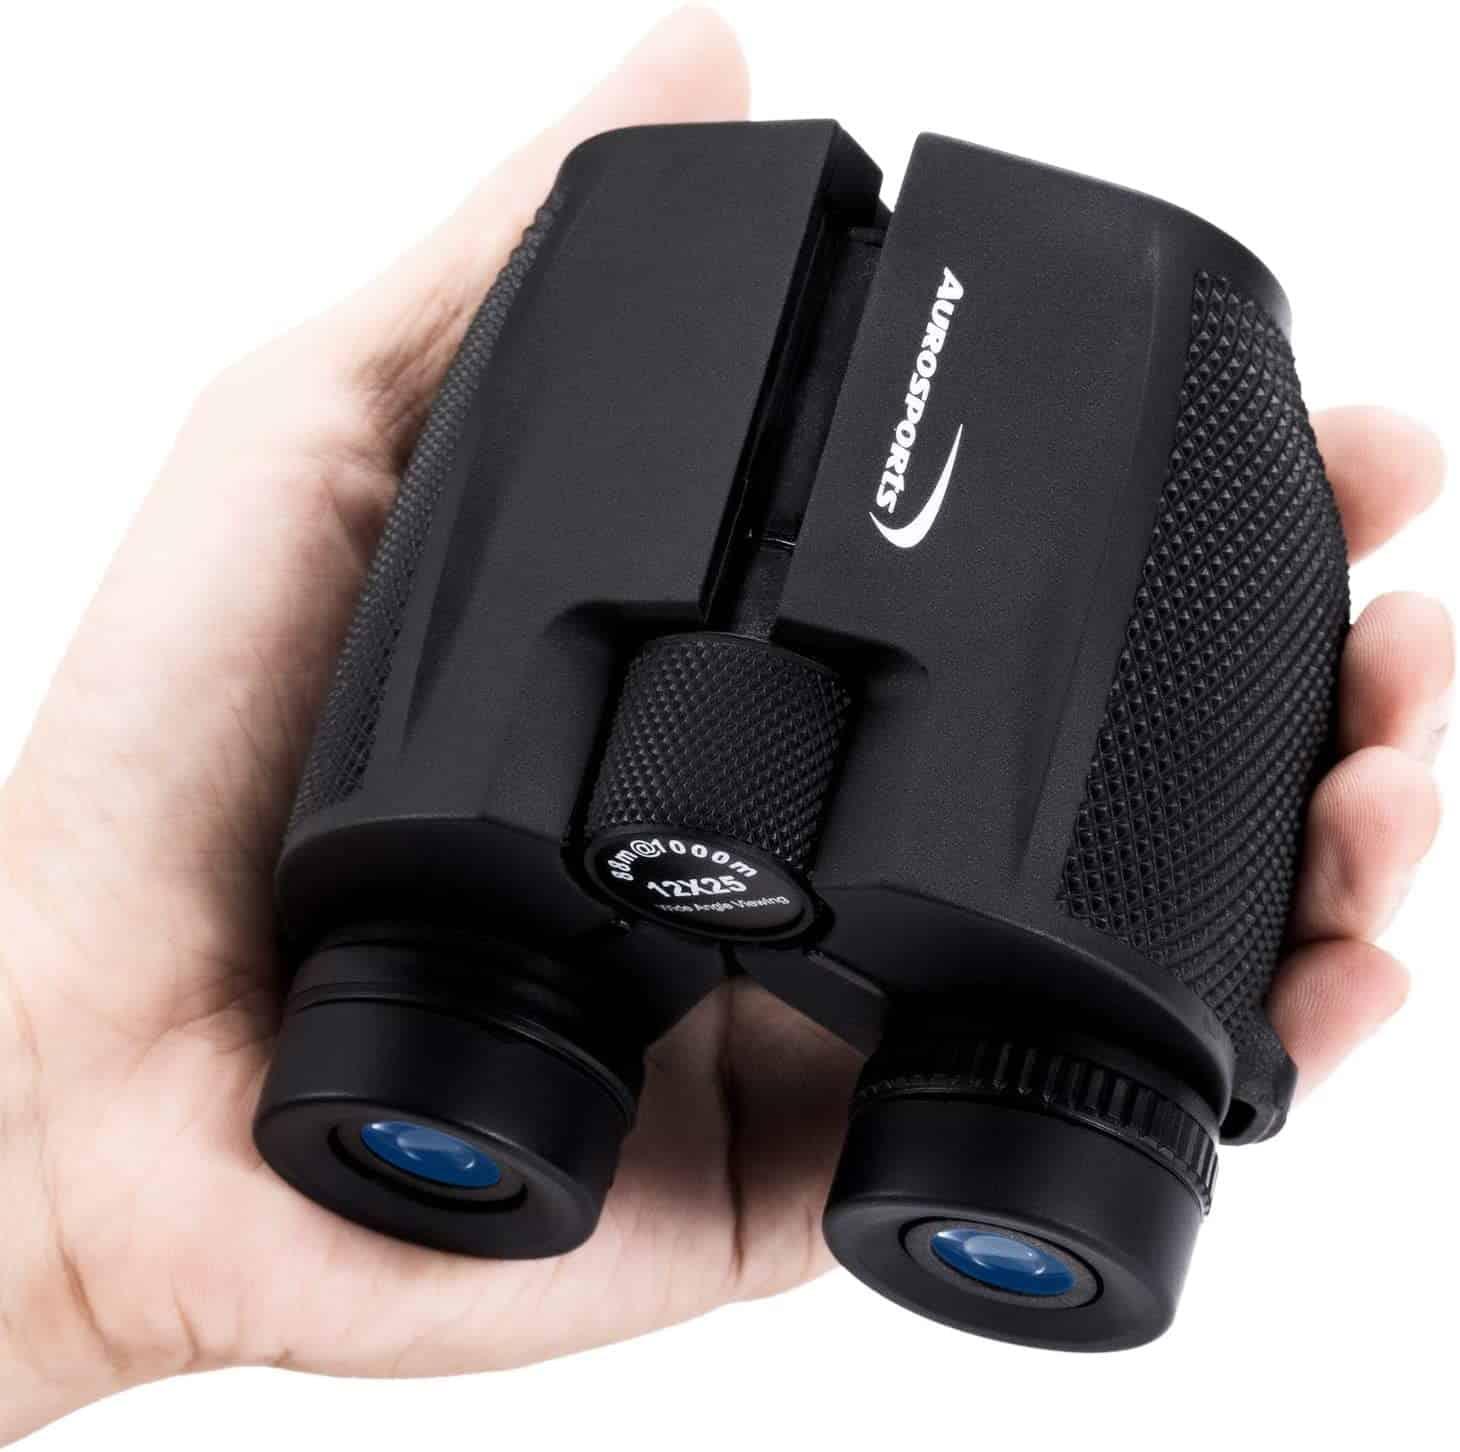 Autosports 12x25 High Power Compact Binoculars Telescope